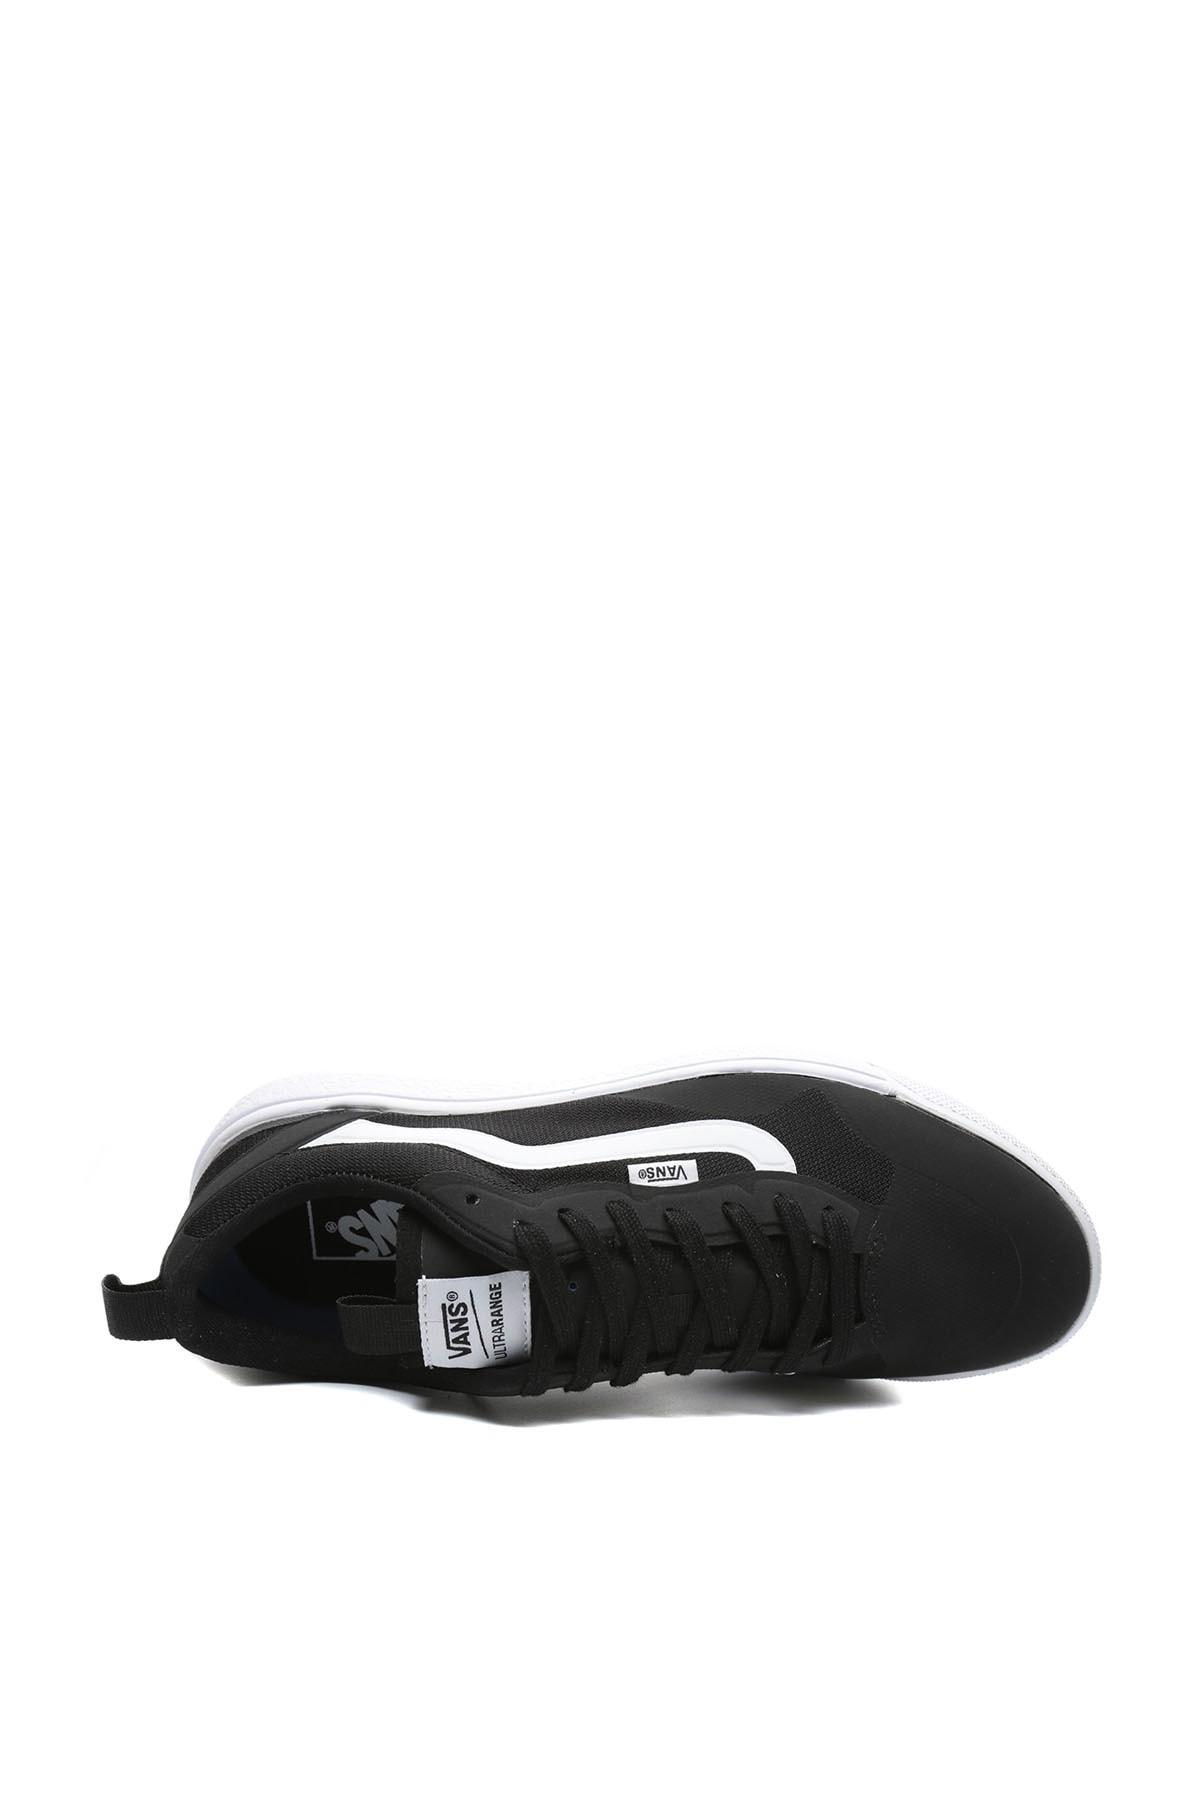 Vans Unisex Spor Ayakkabı - Ua Ultrarange Exo - 0A4U1KBLK1 4